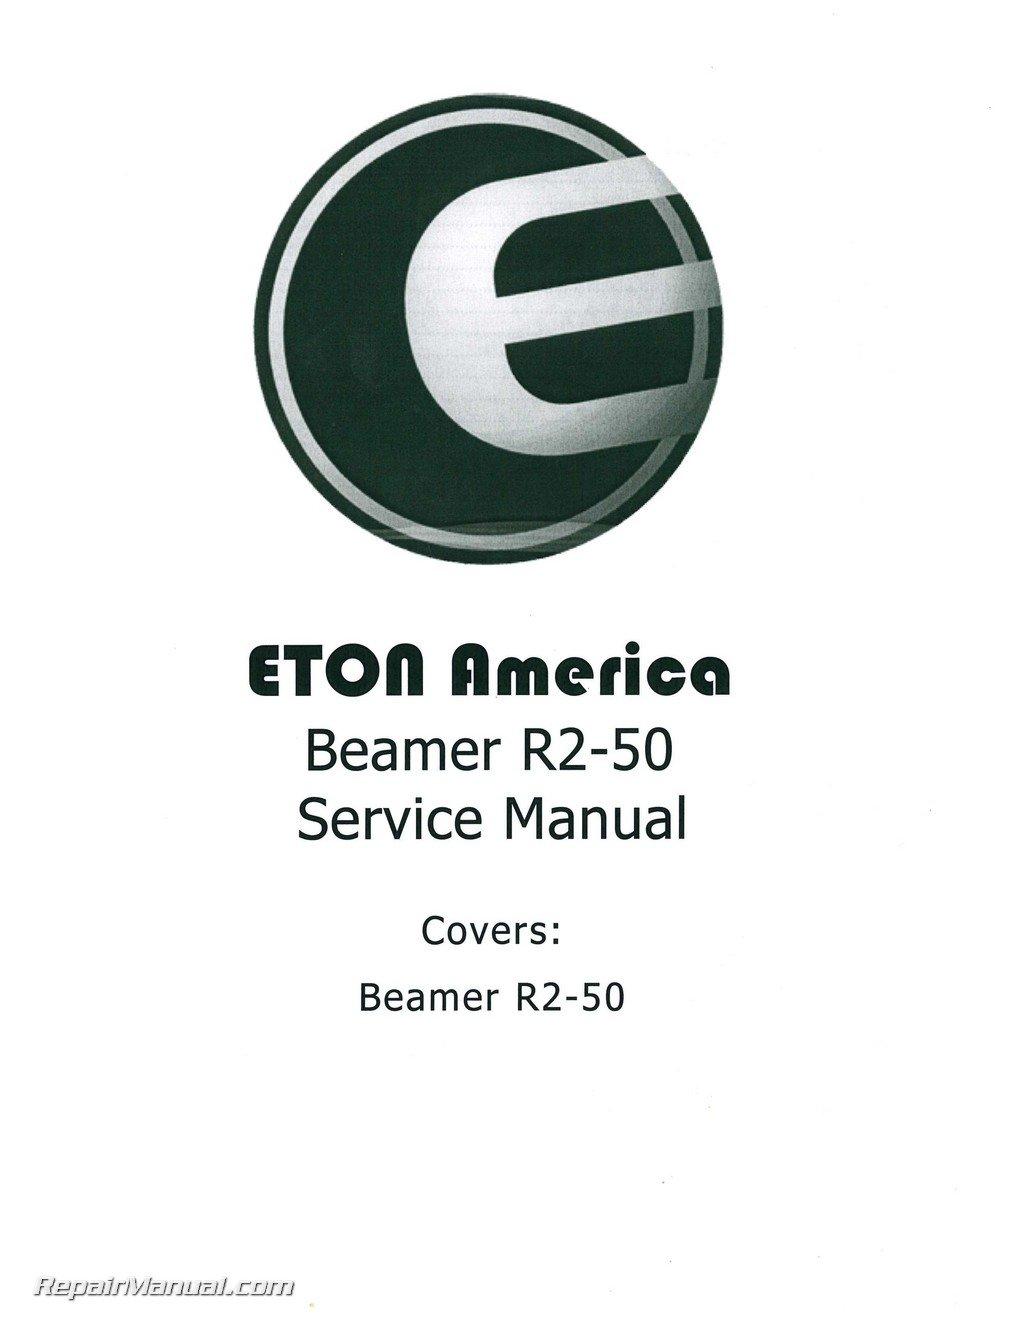 Eton sierra dxl90 service manual   ebay.